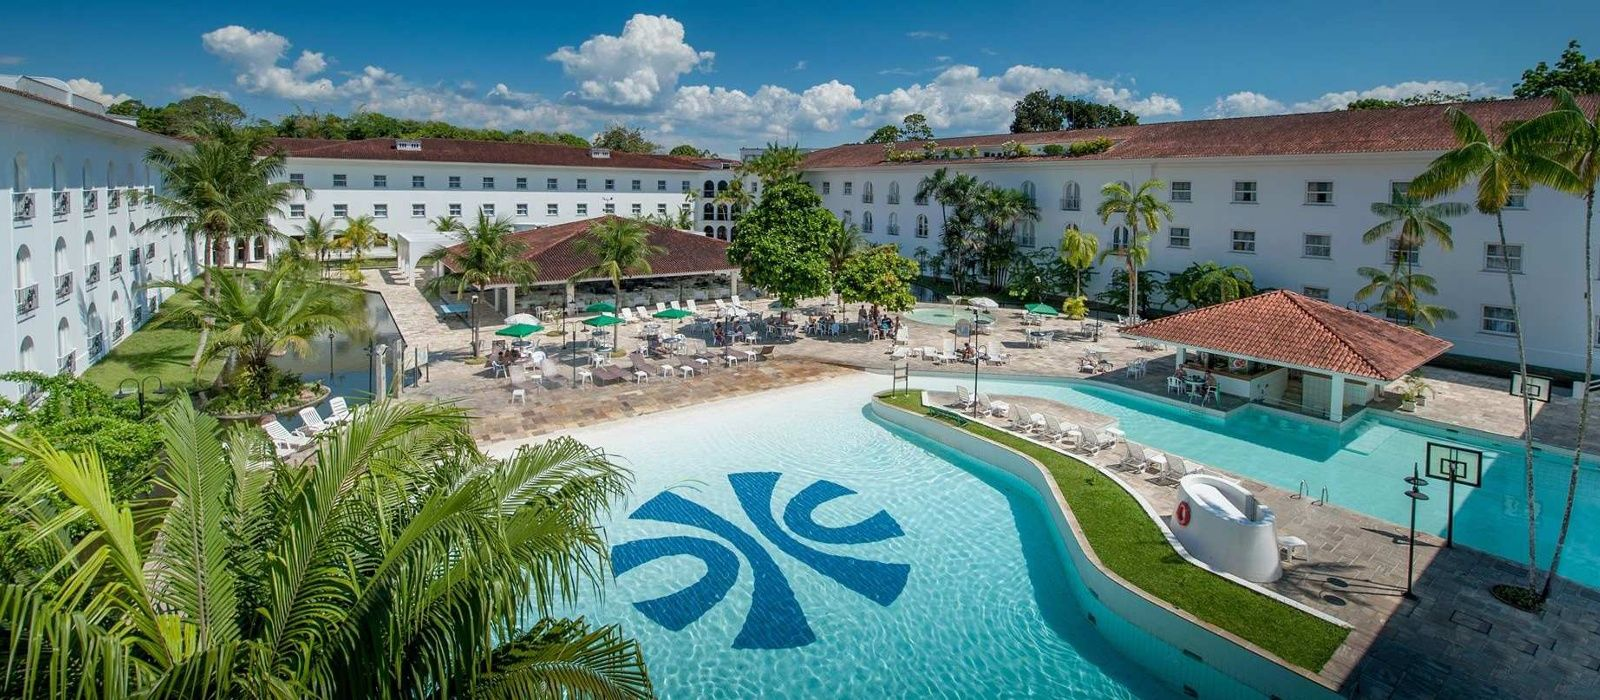 Hotel Tropical Manaus Ecoresort Brazil